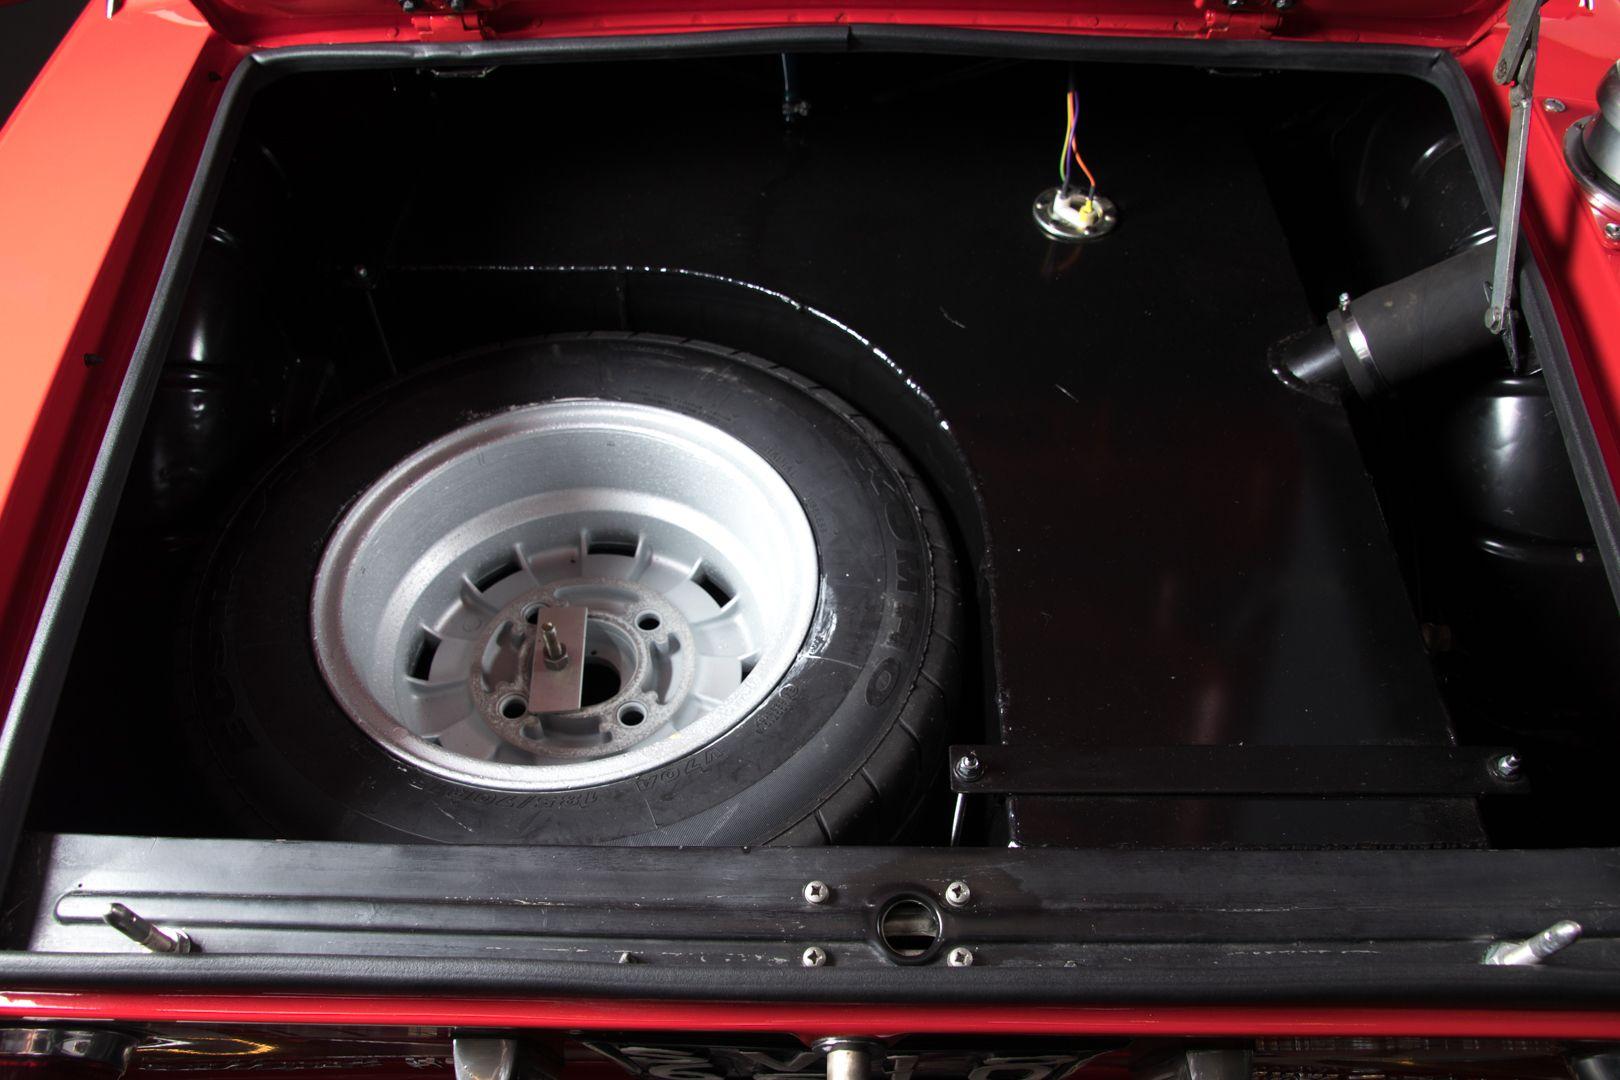 1970 Lancia Fulvia HF 1.6 - Gruppo 4 18830